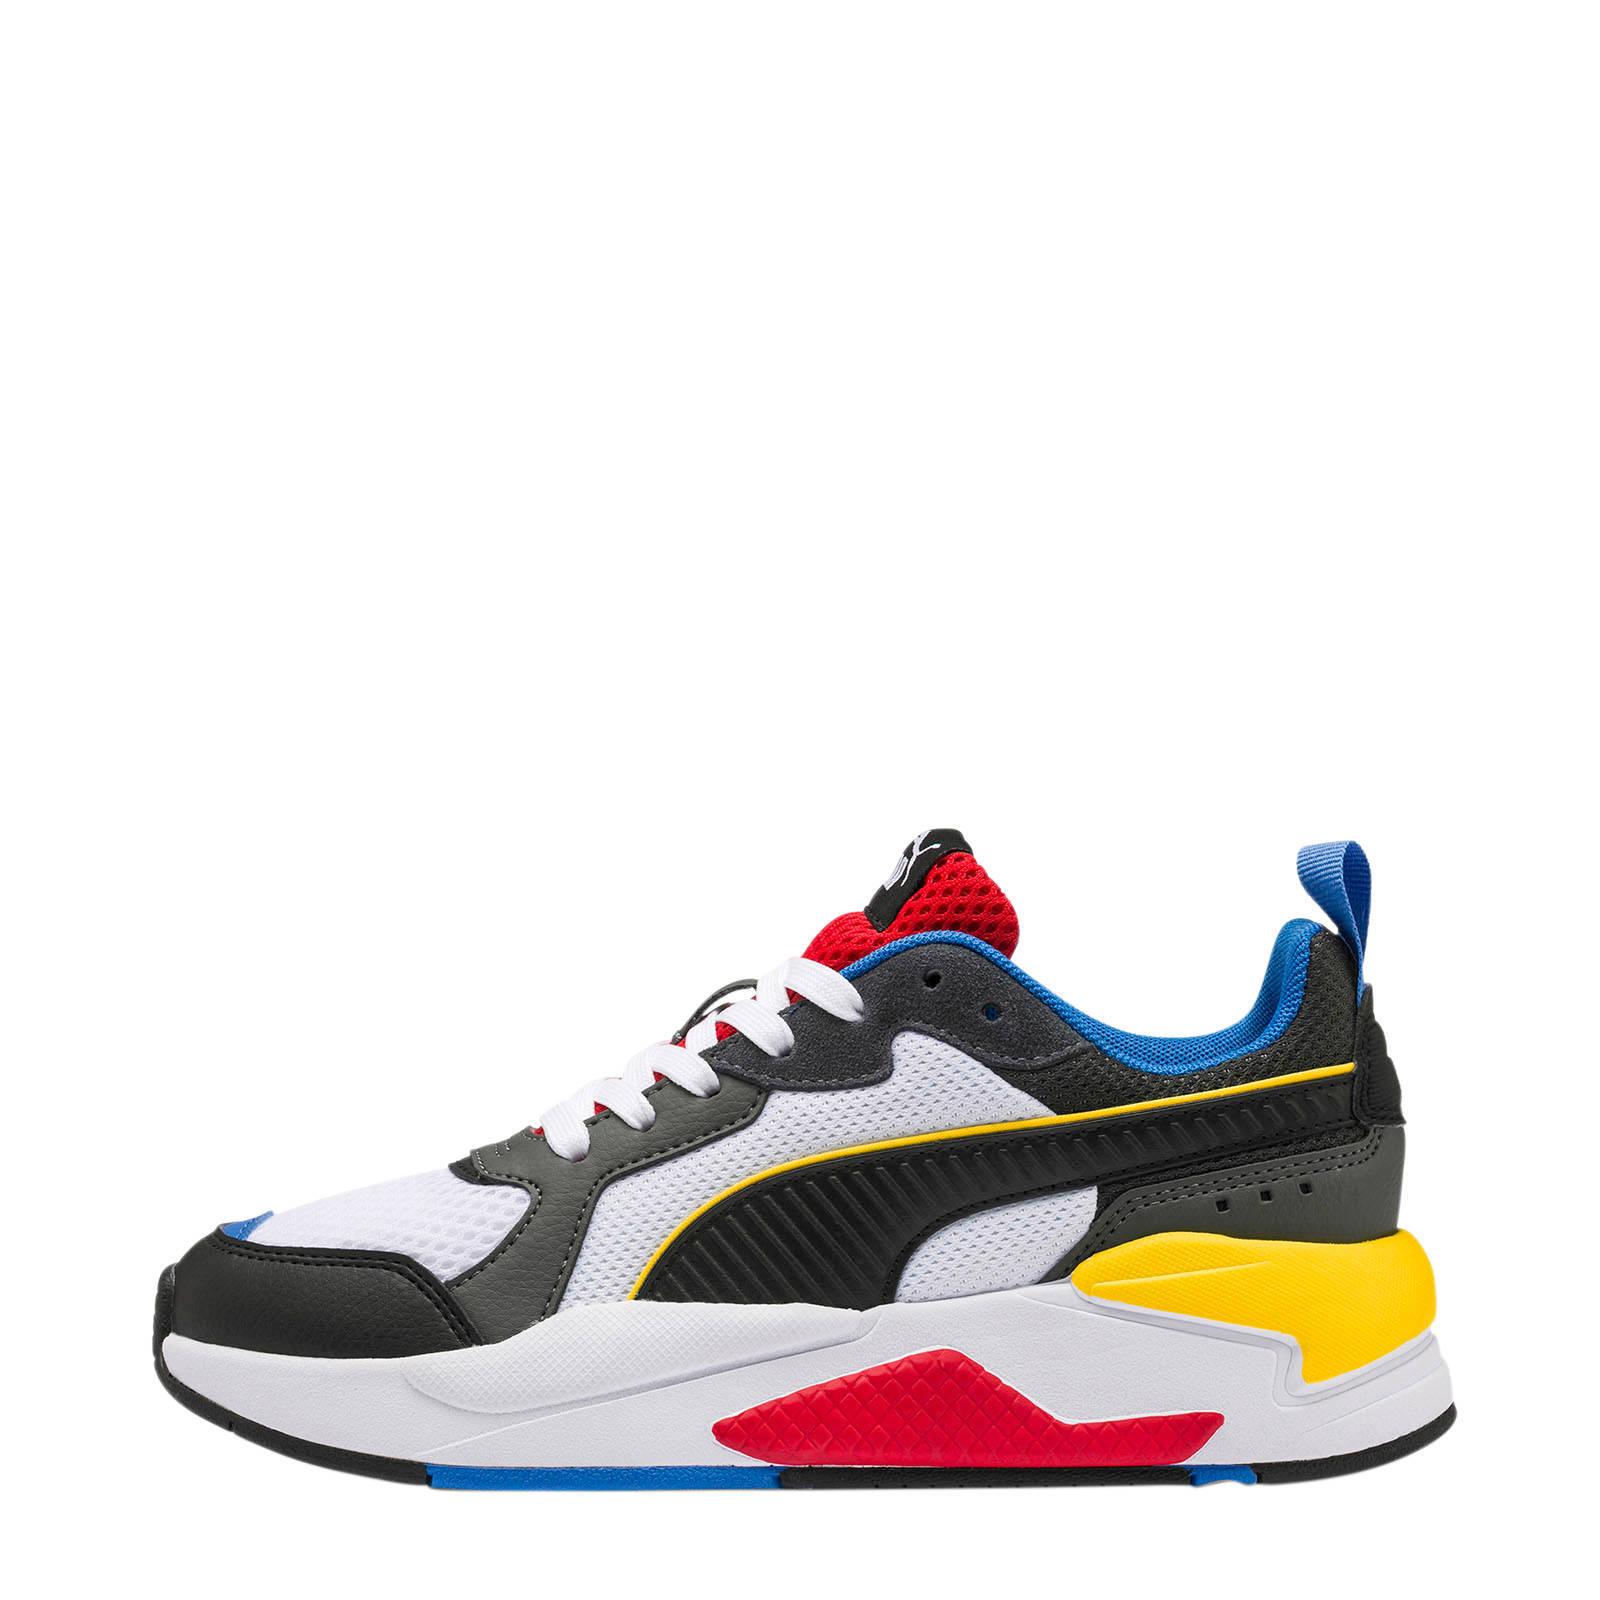 Puma X-Ray Jr sneakers wit/zwart/geel   wehkamp